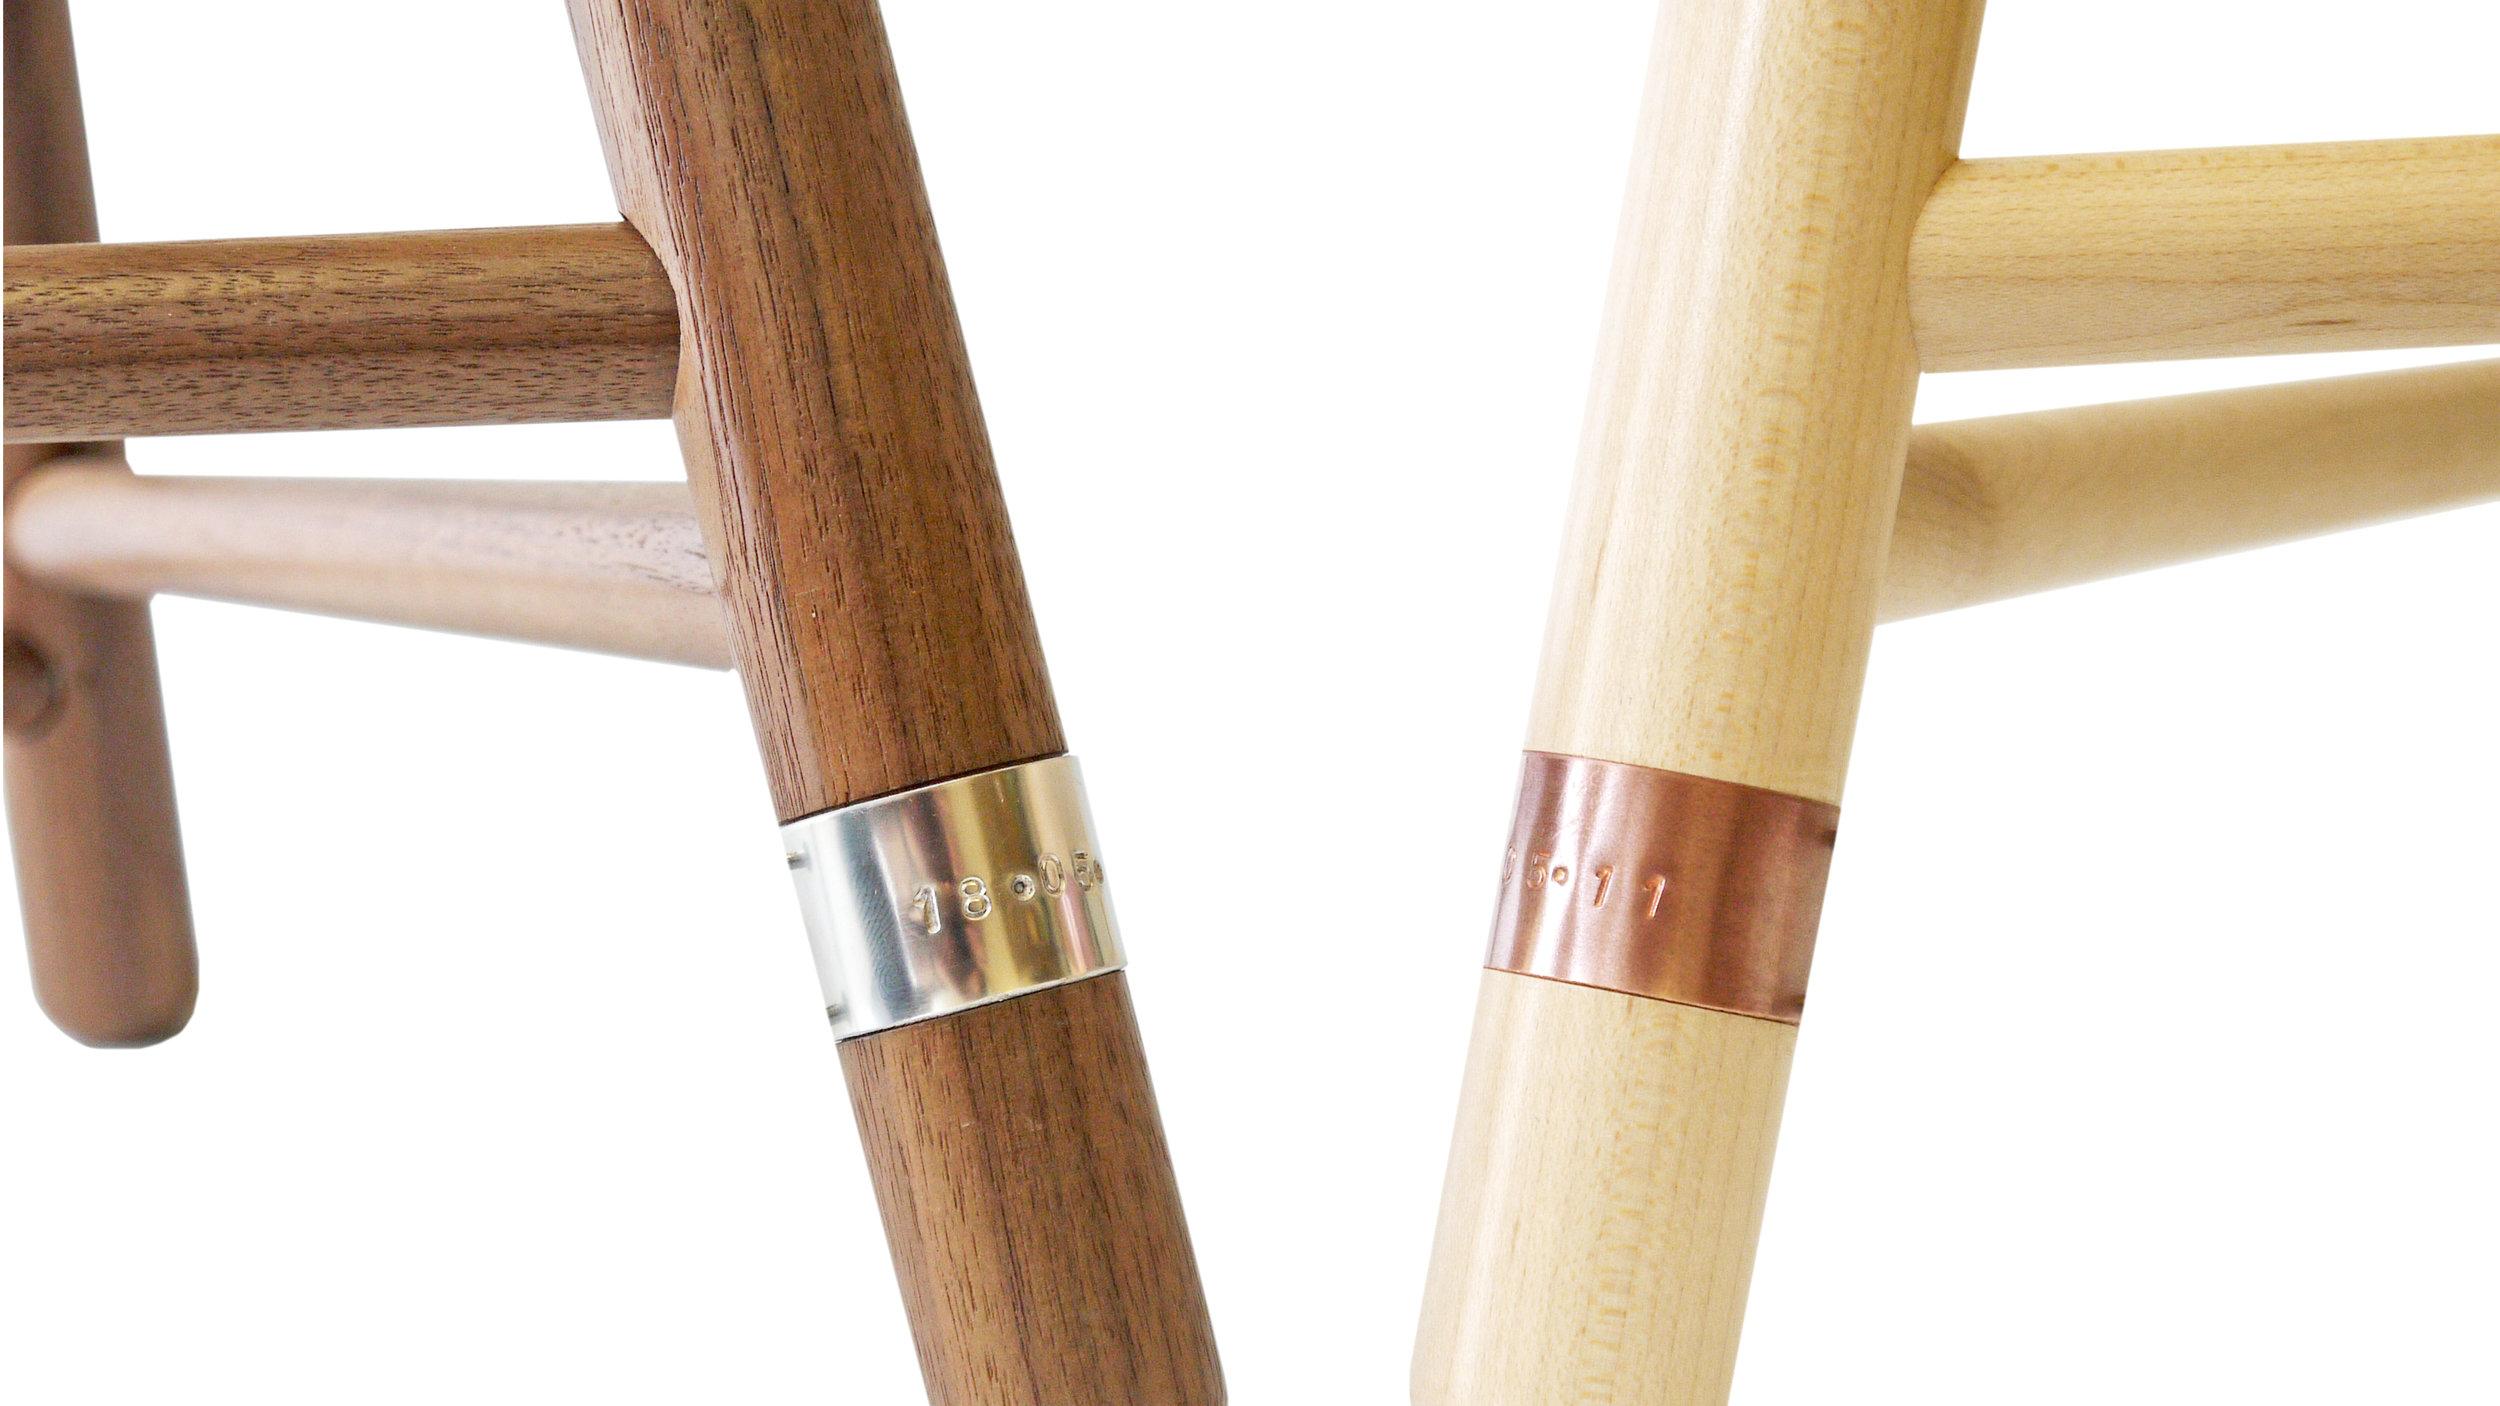 James Plant Design Studio- PLantandmoss- Companion-stool-detail.jpg